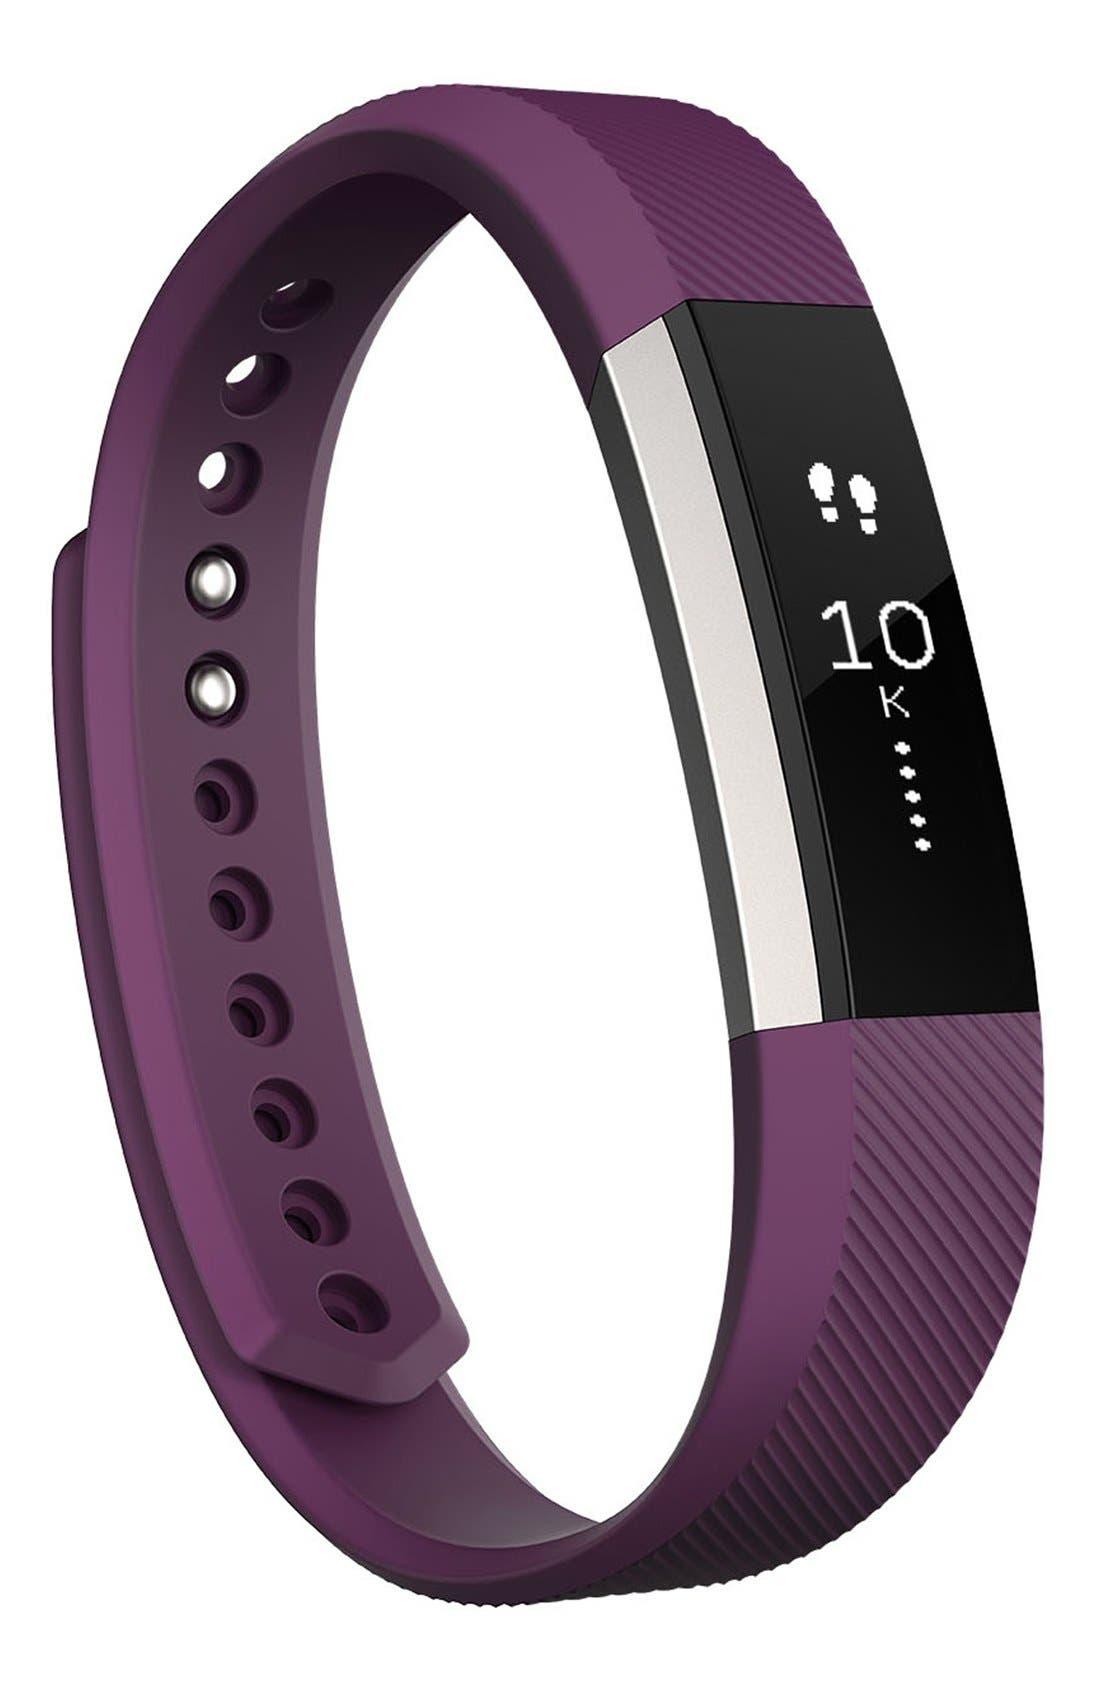 Fitbit 'Alta' Wireless Fitness Tracker